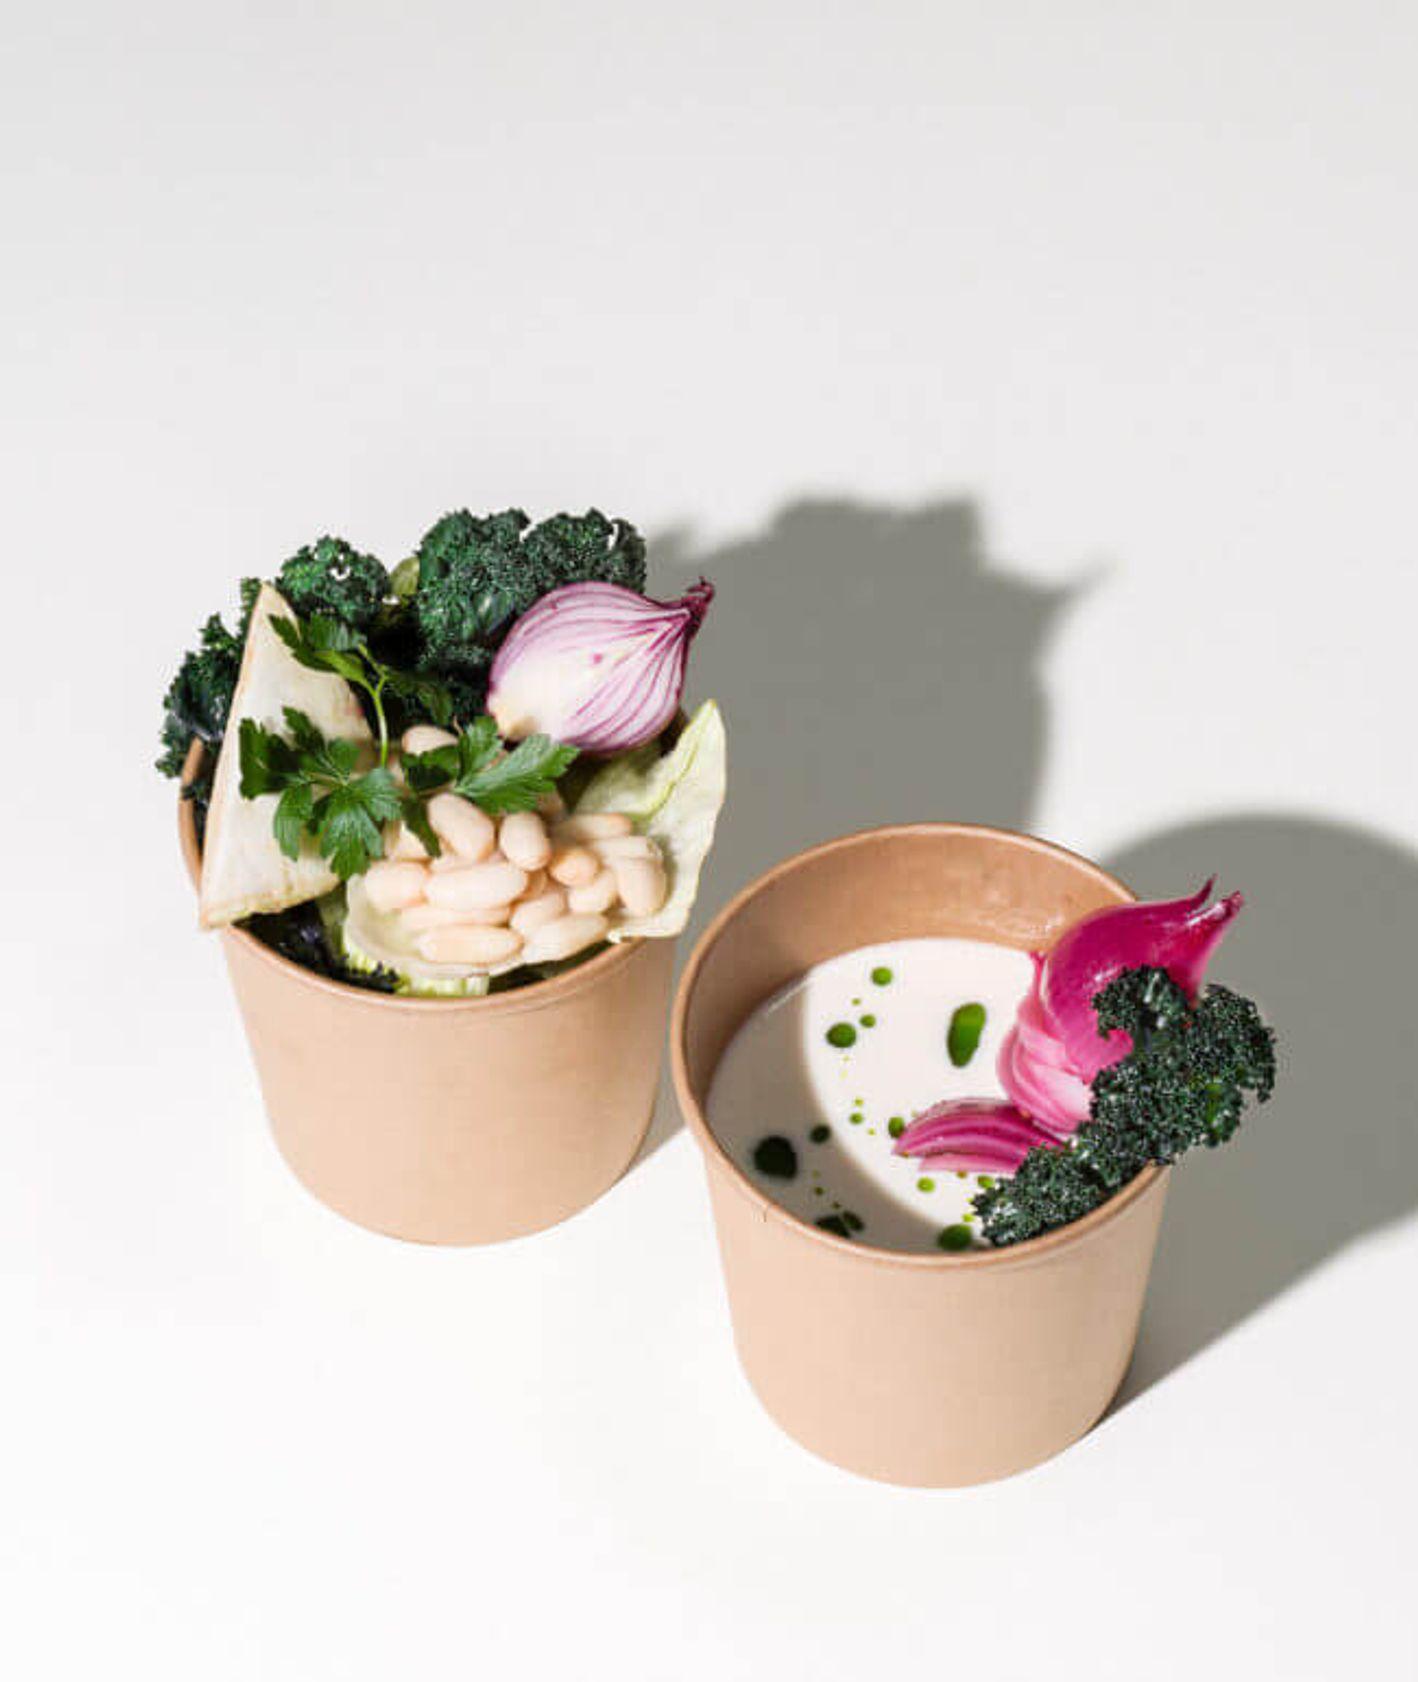 zupa krem z selera i pietruszki, wegańska zupa krem, wegański krem z białych warzyw, krem z selera, rozgrzewająca zupa krem, zupa krem kukbuk, krem z fasoli, zupa krem z fasoli